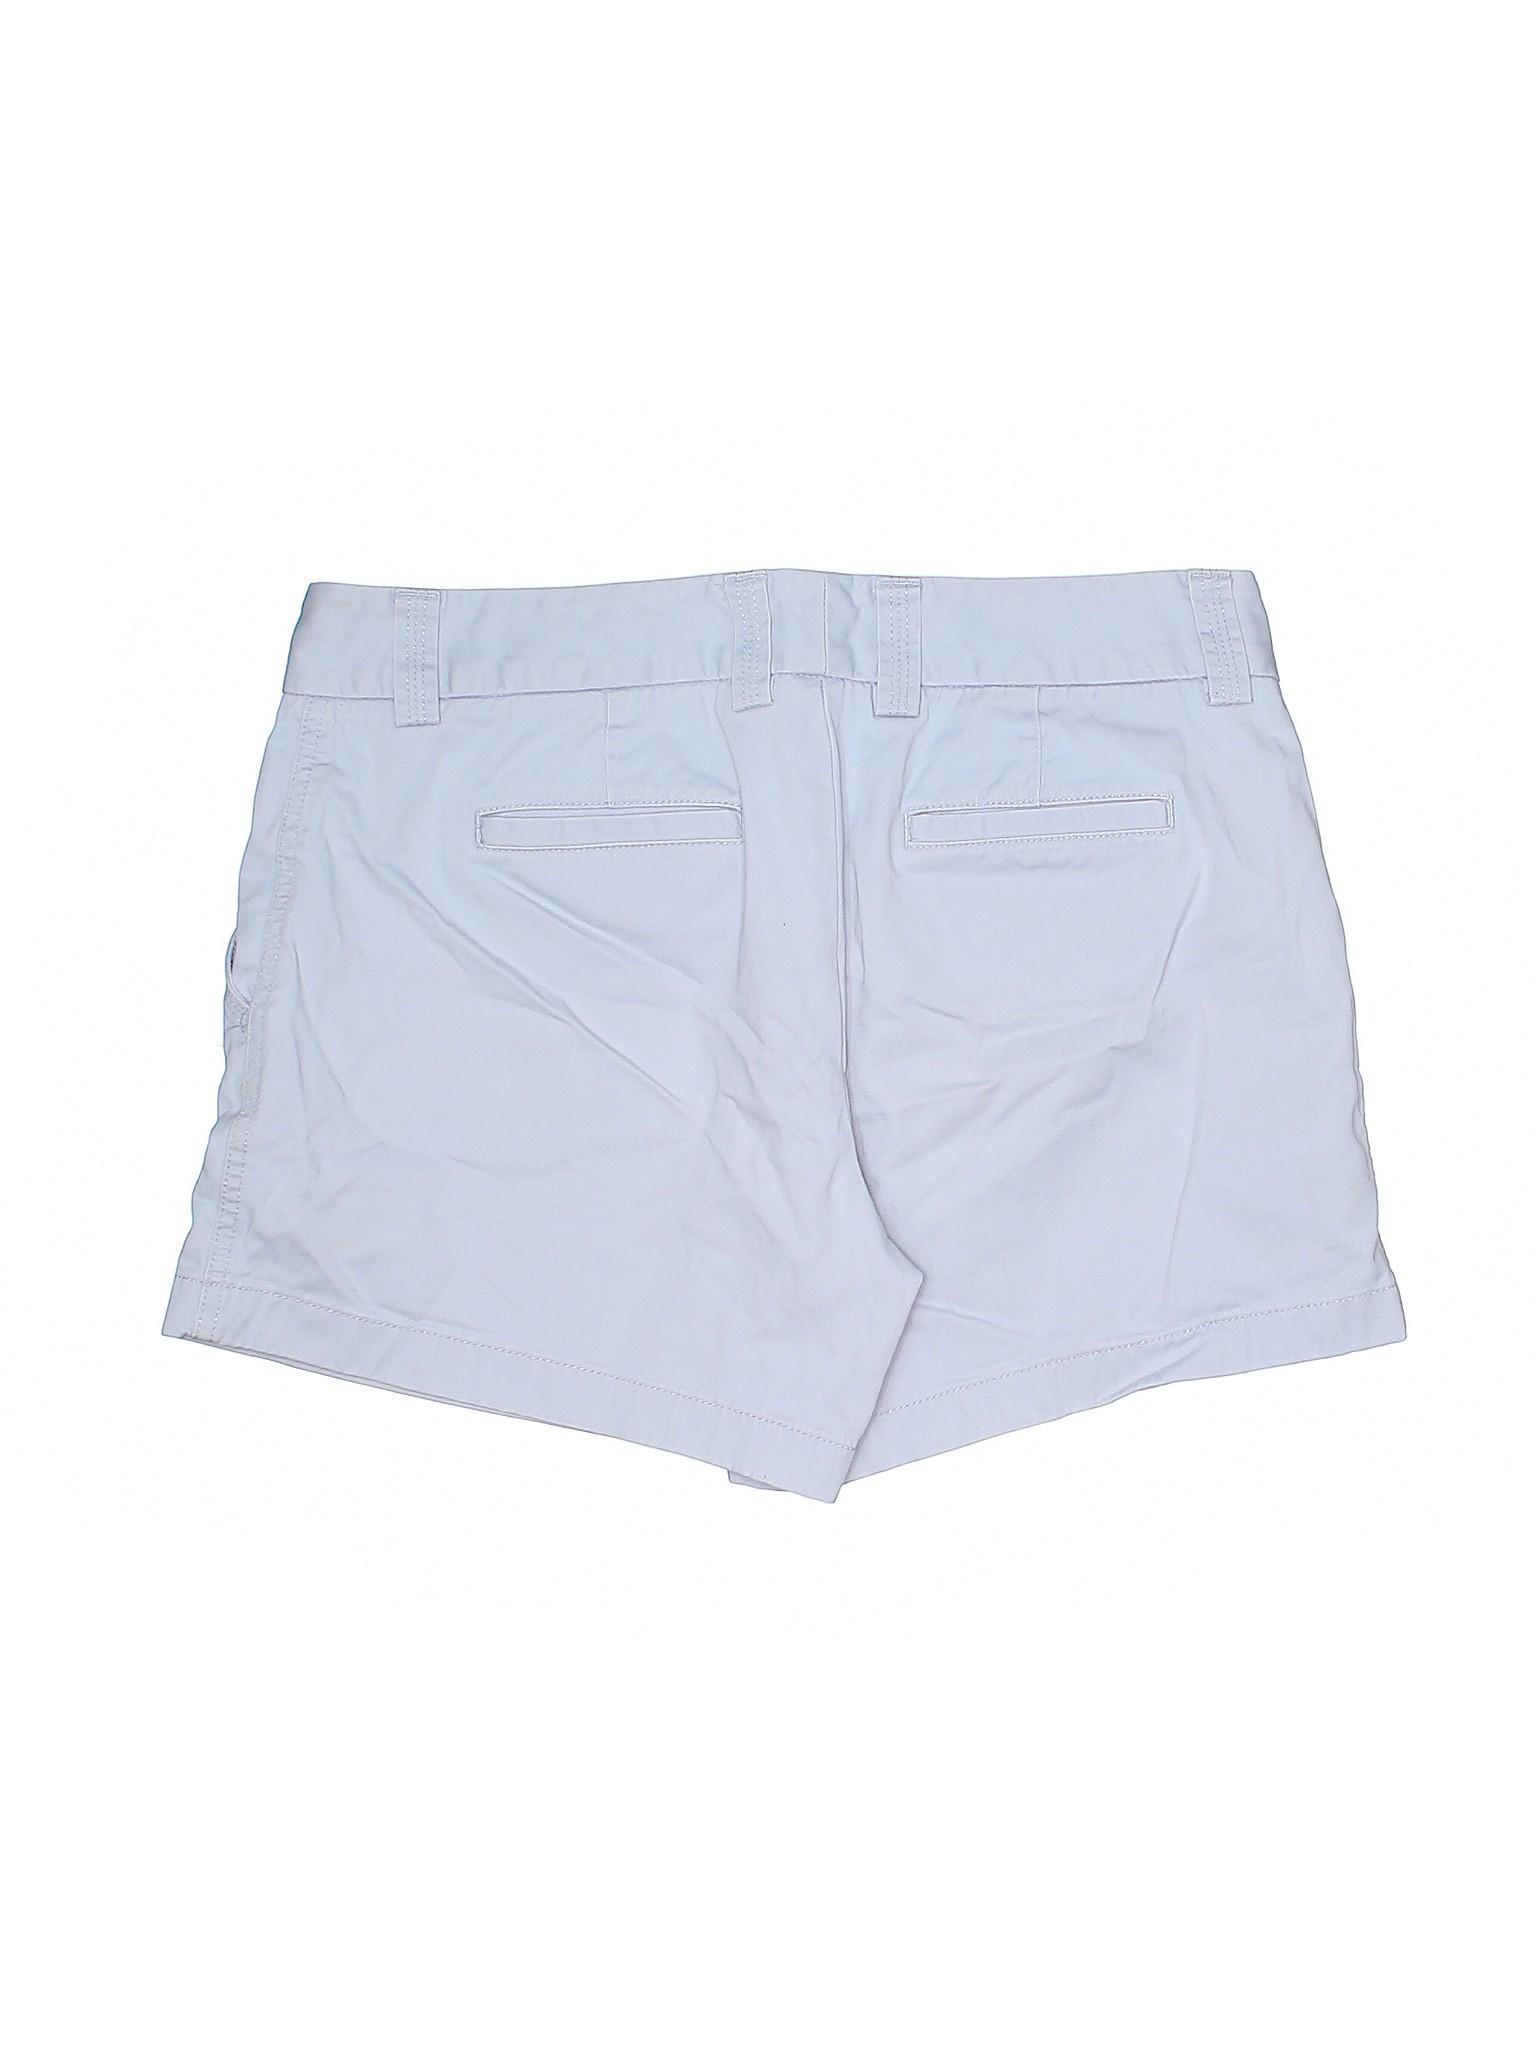 winter Khaki J Crew Shorts Boutique zxdwd